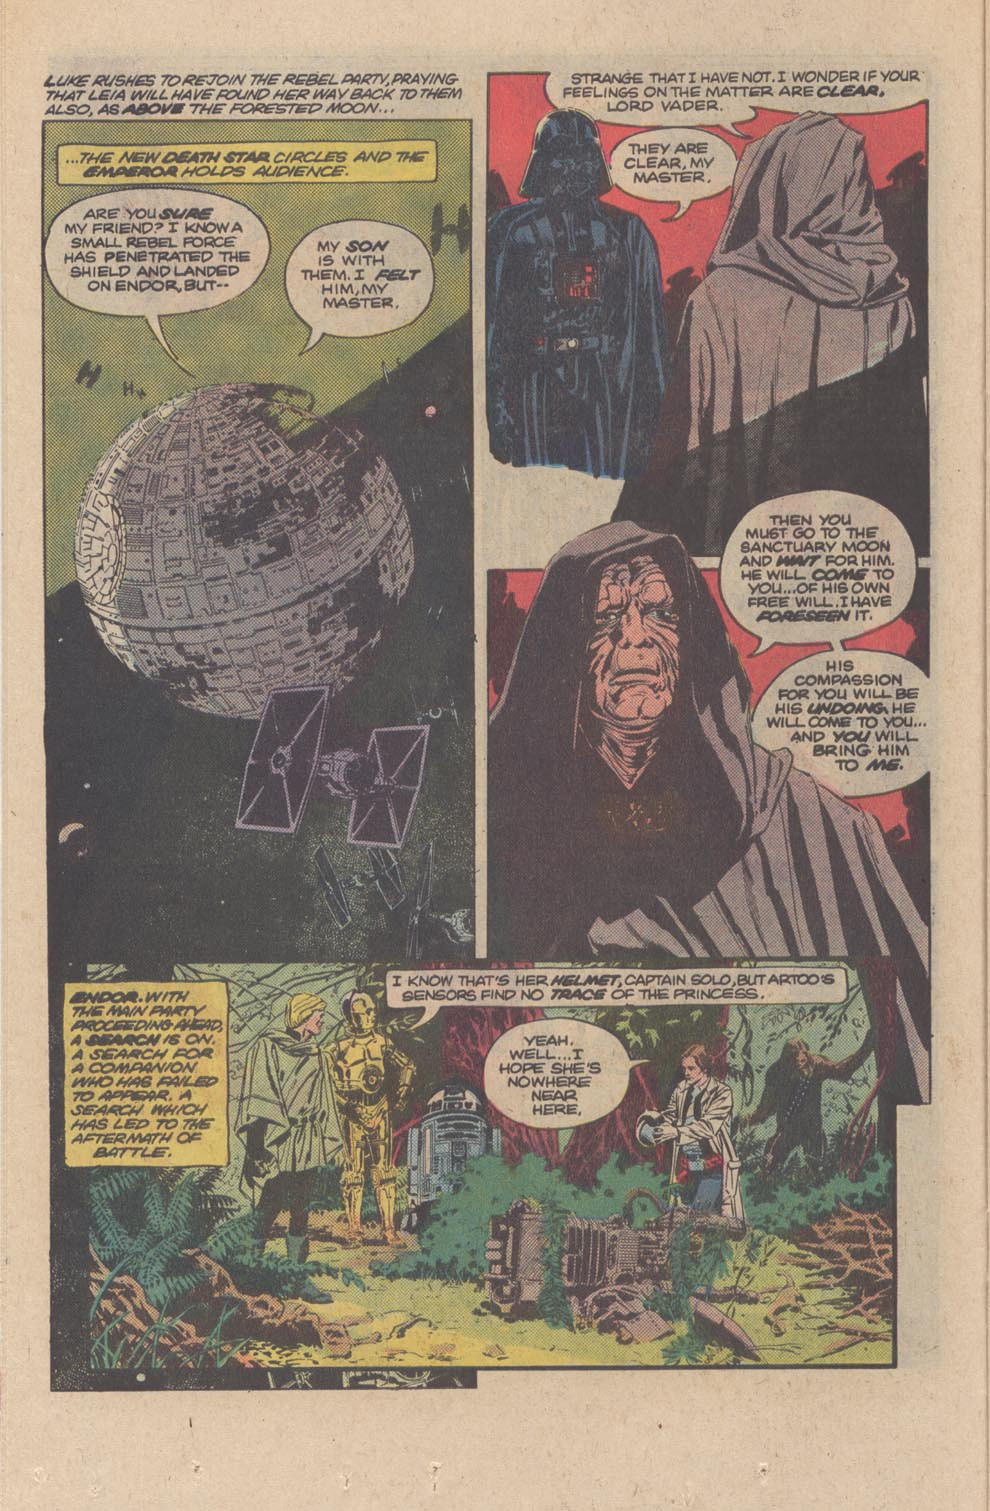 Read online Star Wars: Return of the Jedi comic -  Issue #3 - 13